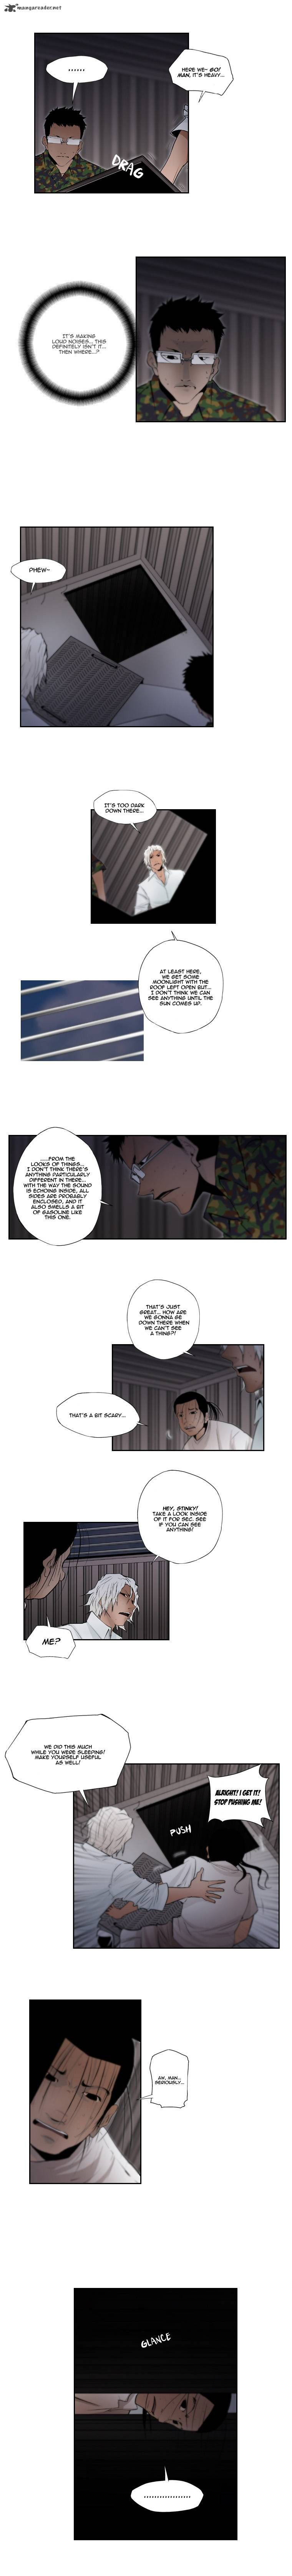 Banquet Box 19 Page 2